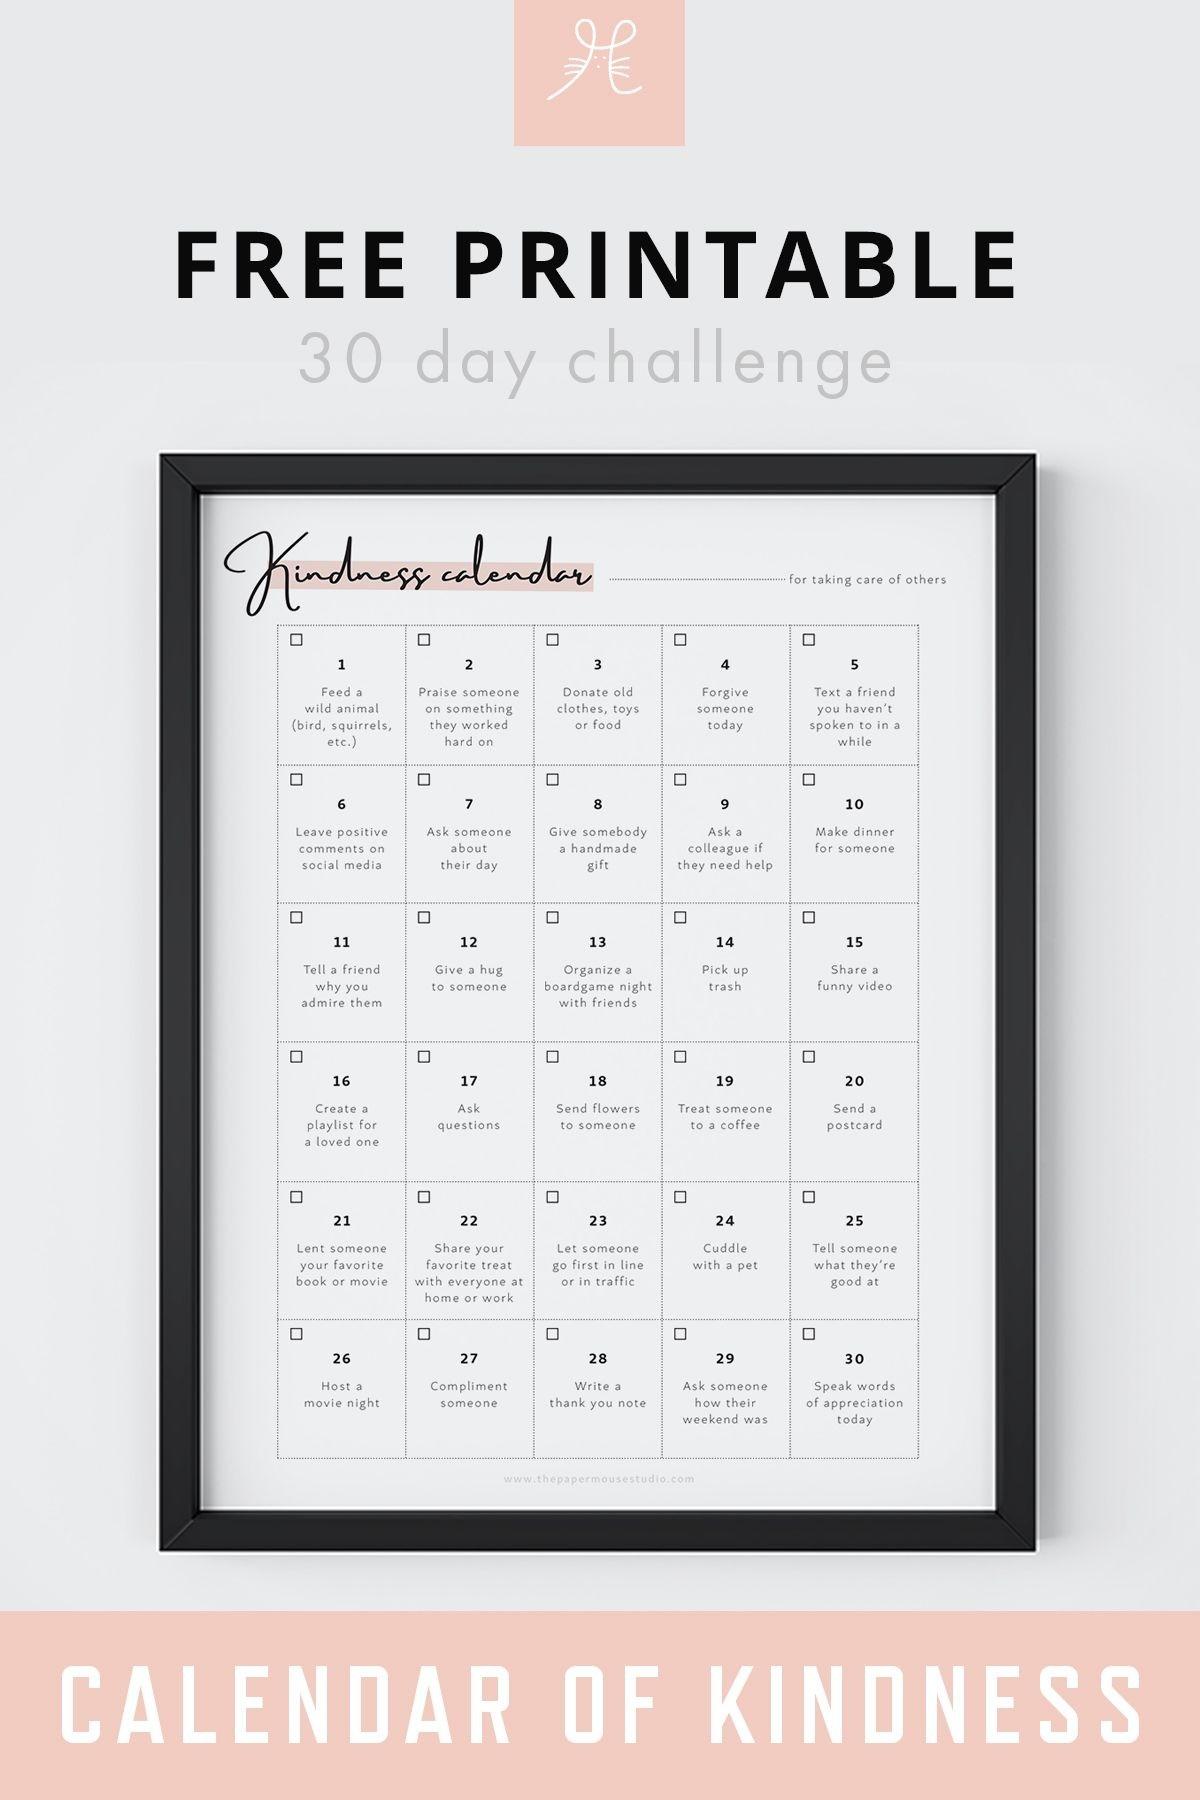 Free Printable 30 Day Challenge Calendar Of Kindness | Selflove  Printable Calendar Day By Day